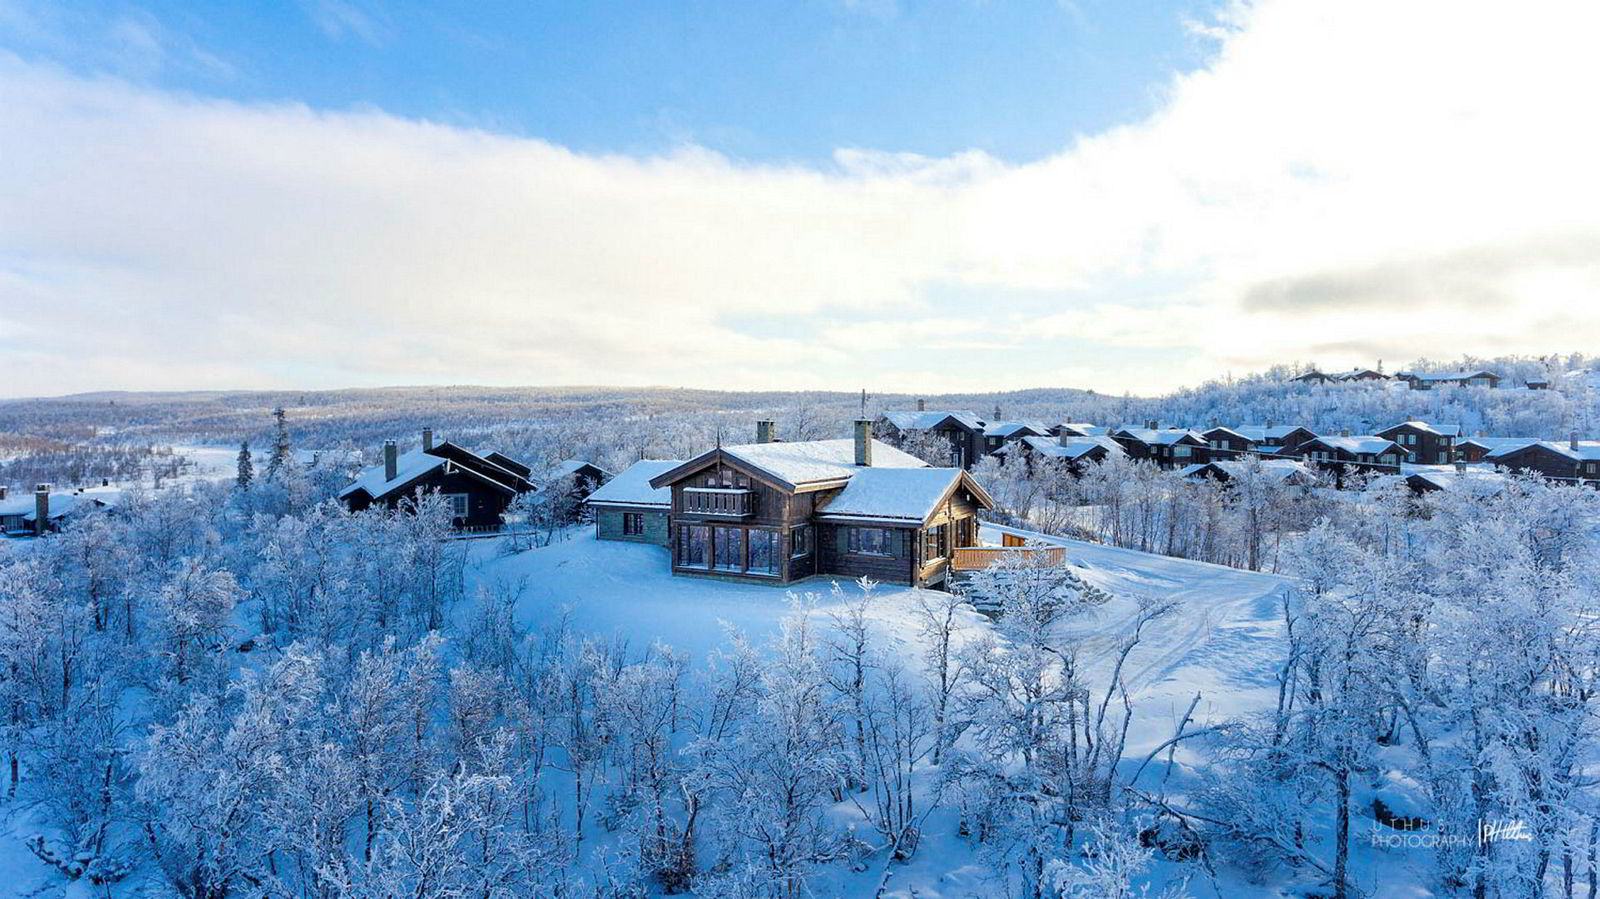 Hytte i Lomtjødnlie 73 i Kikut, 243 kvm, Prisantydning Kr 12 000 000, solgt for kr 11 500 000.